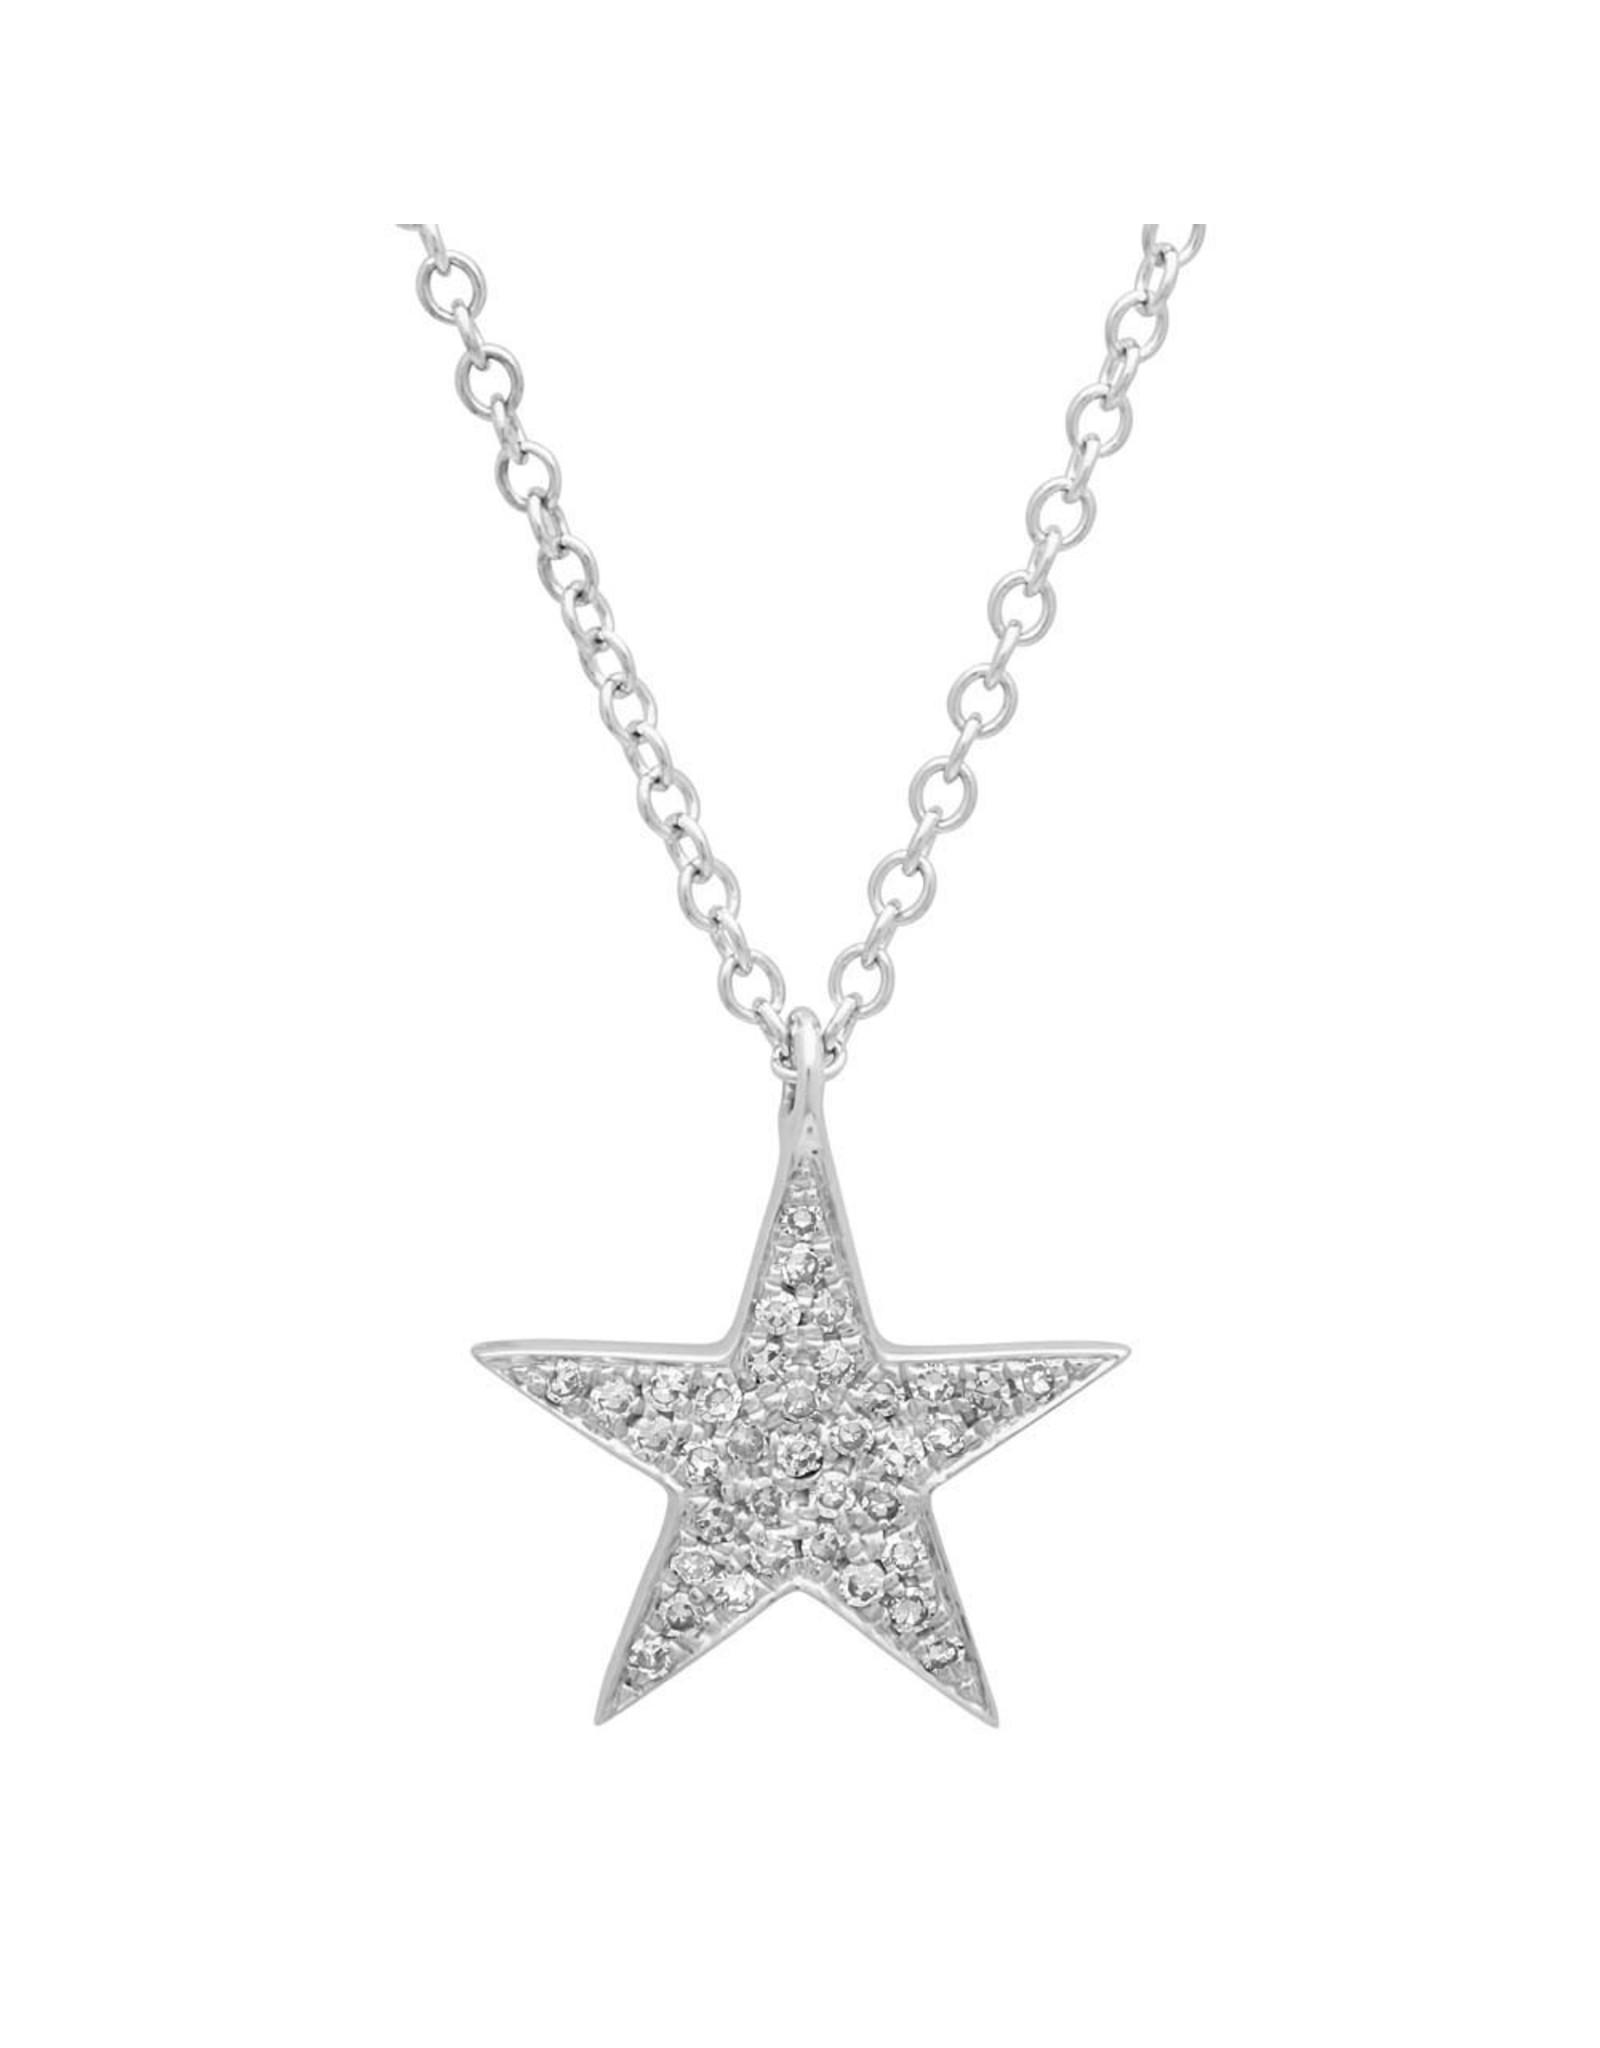 14K White Gold Pave Diamond Star Necklace, D: 0.09ct